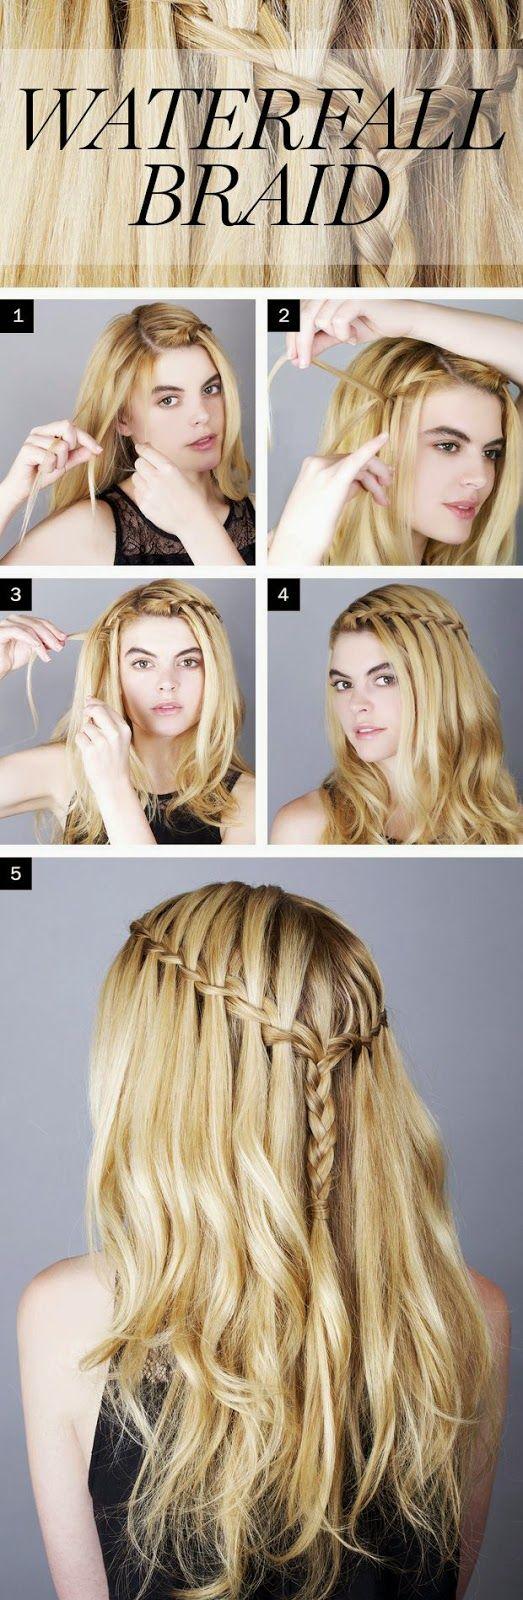 How to Waterfall Braid Your Own Hair? - Must Check! ~ Entertainment News, Photos & Videos - Calgary, Edmonton, Toronto, Canada